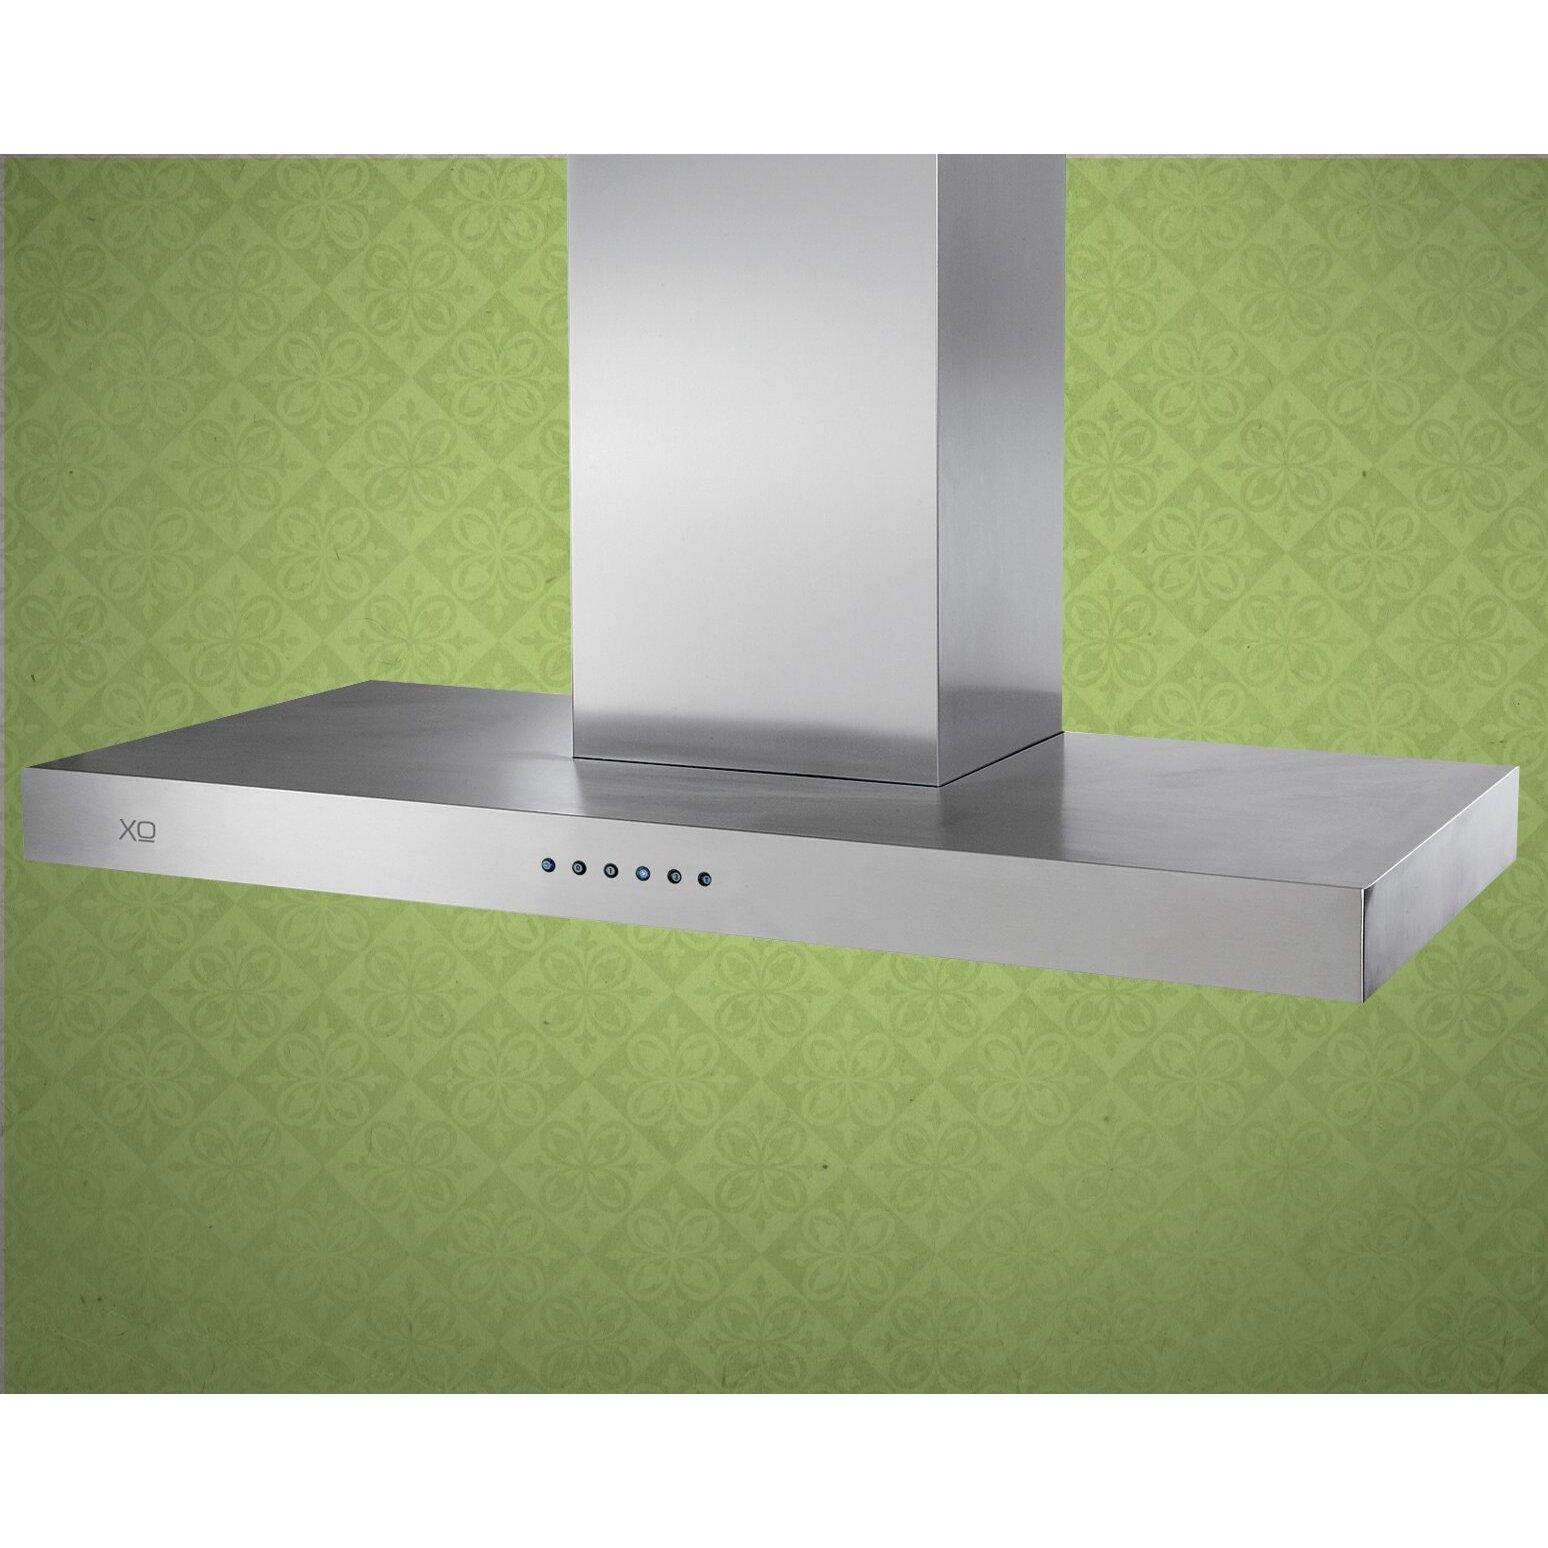 "Xo Kitchen: XO Ventilation 24"" 600 CFM Wall Mount Range Hood"